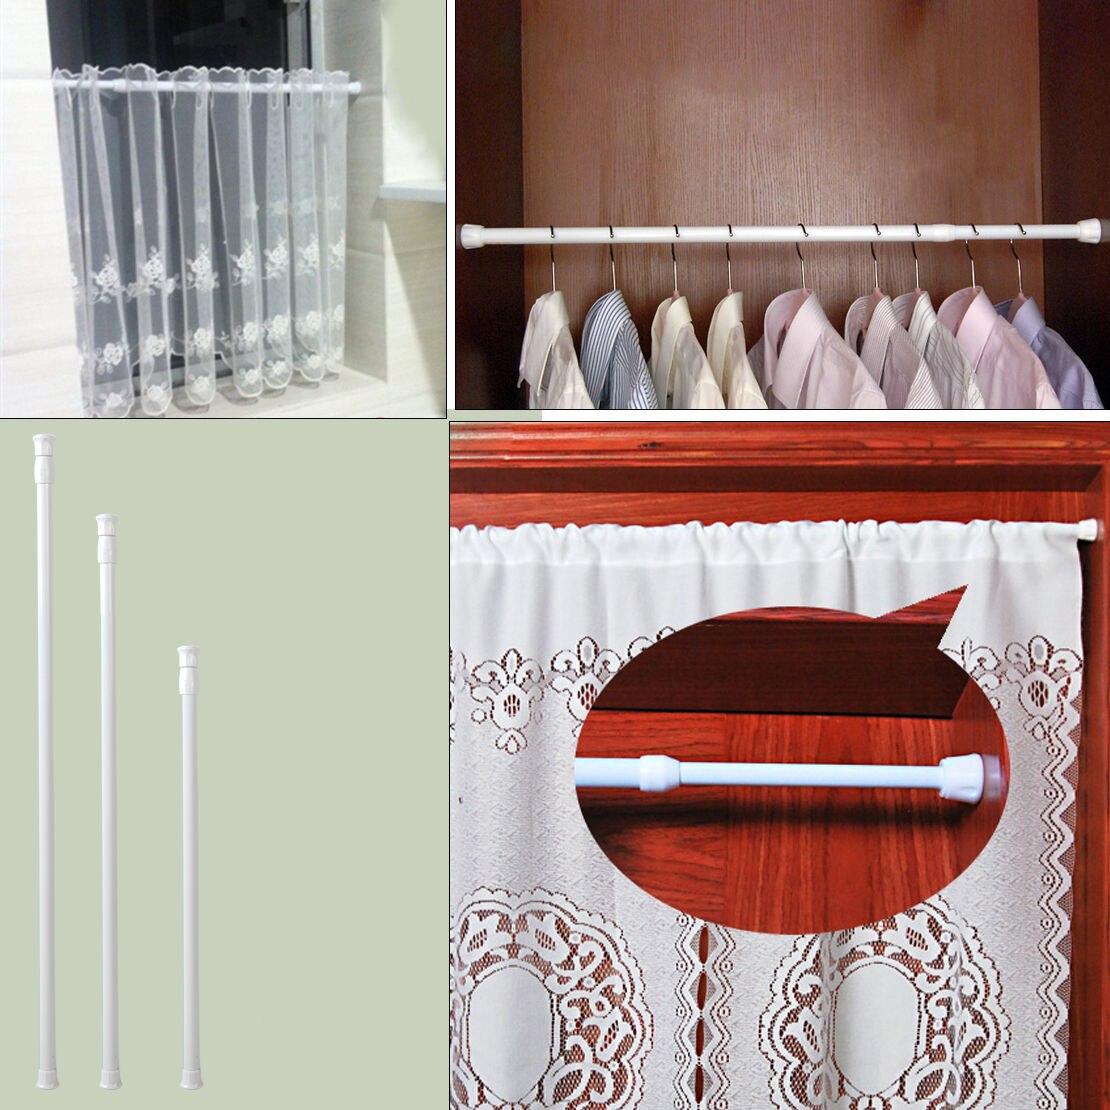 High Carbon Steel Adjustable Rod Tension Bathroom Curtain Extensible Rod Hanger L ...